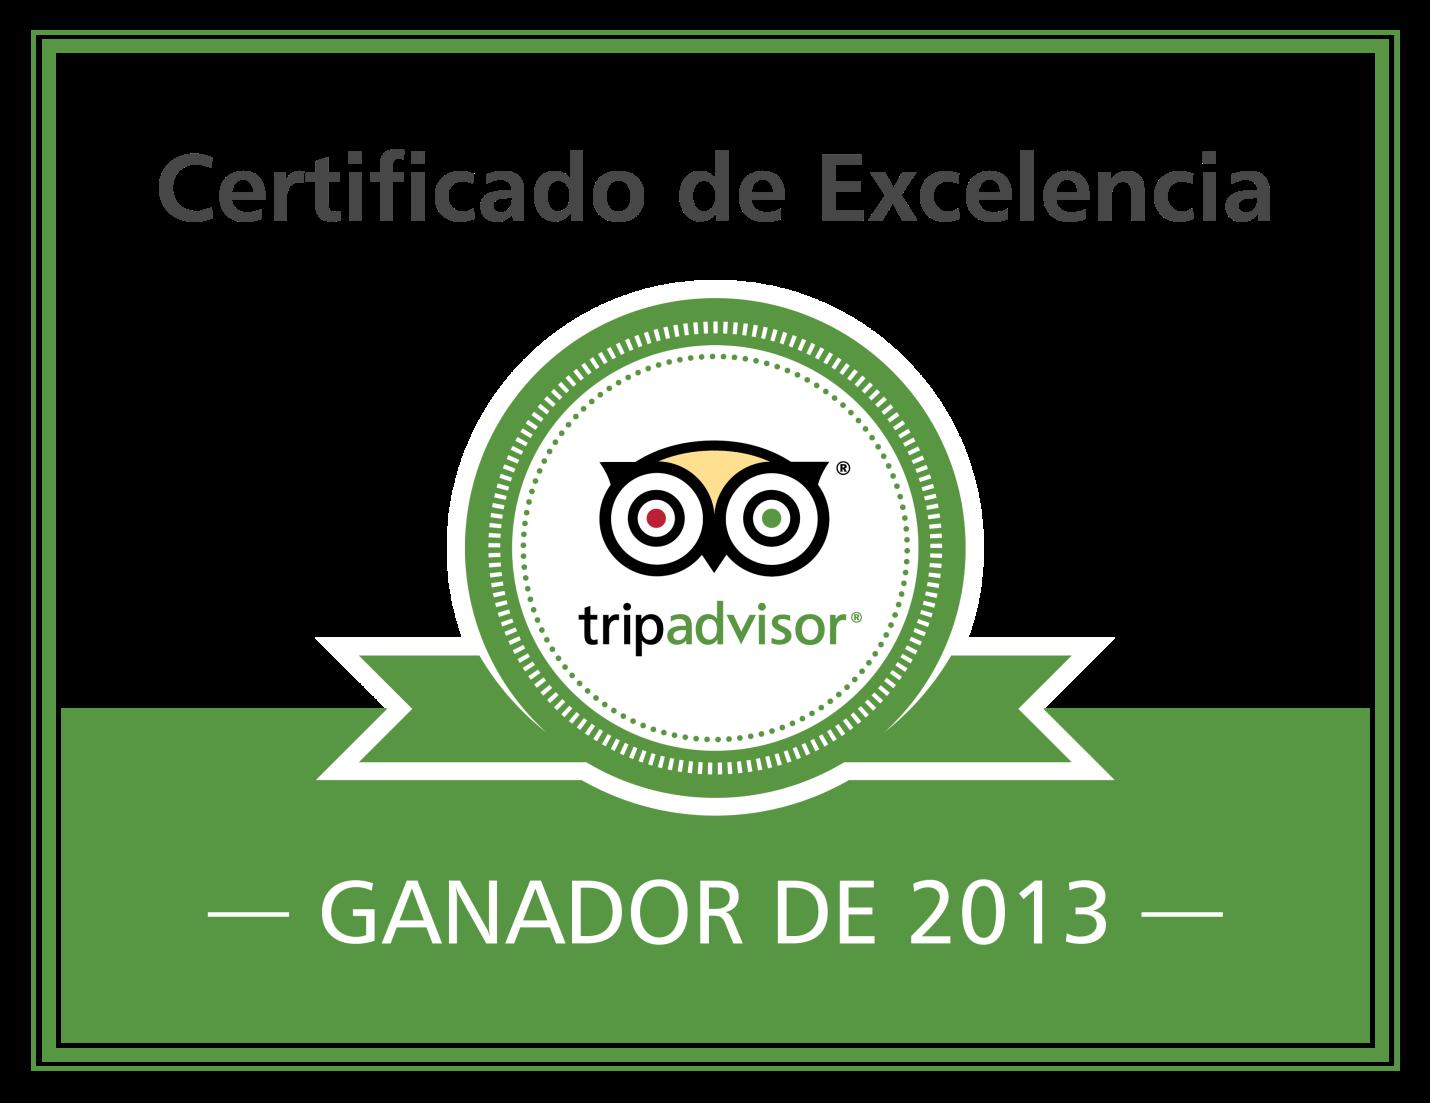 CERTIFICADO DE EXCELENCIA 2013